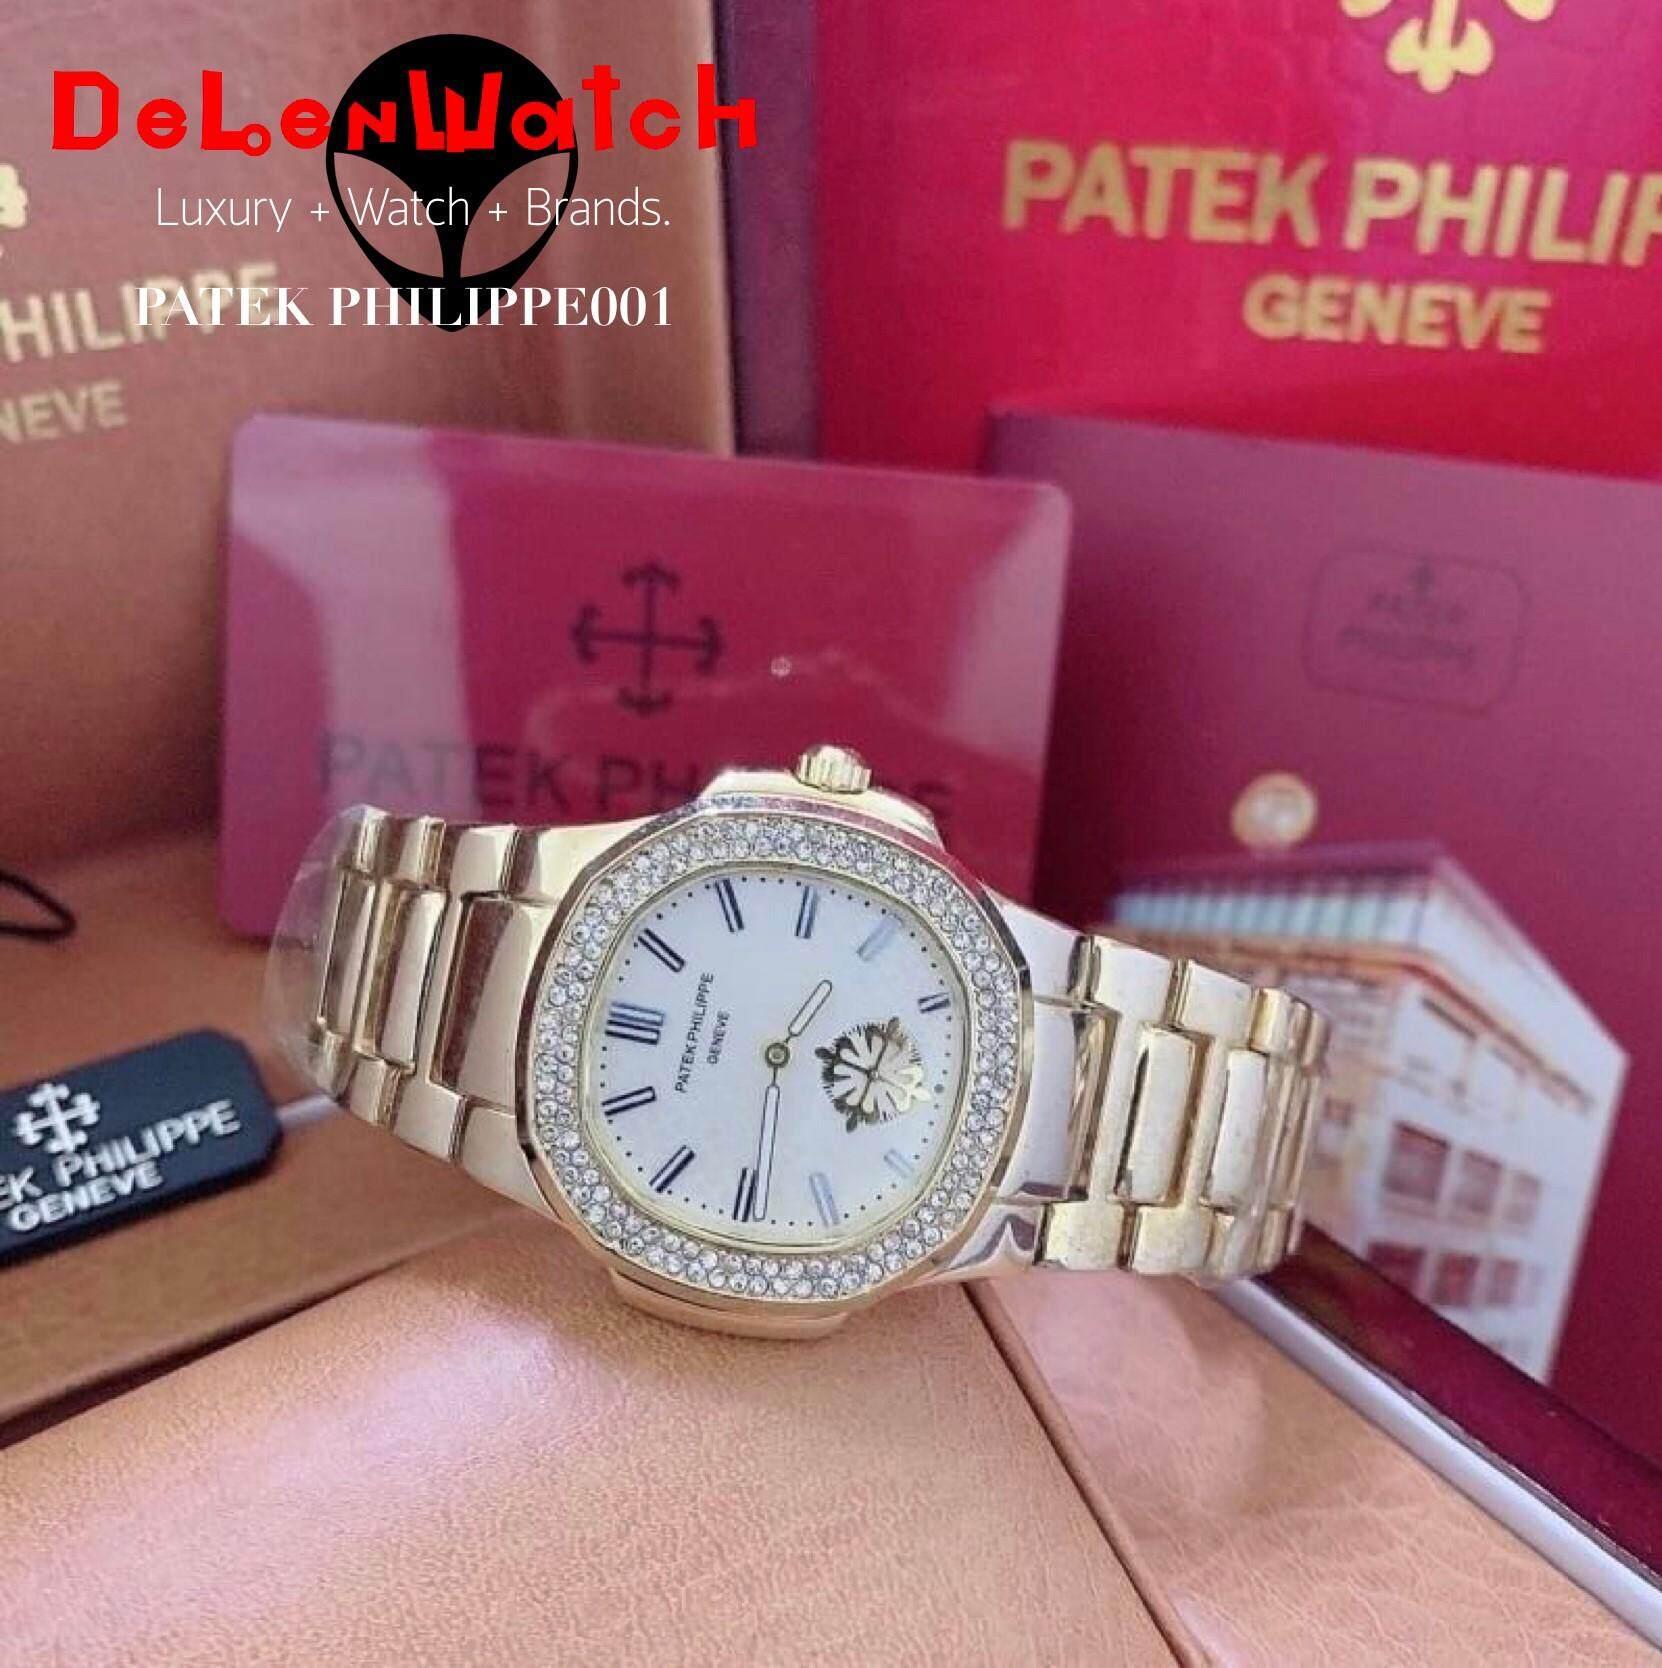 [ DeLenWatch ]-[ Patekwatch ]-stainless gold-นาฬิกาปาเต็ก สายสแตนเลส วงในใช้งานได้ ขนาดหน้าปัด 34 mm